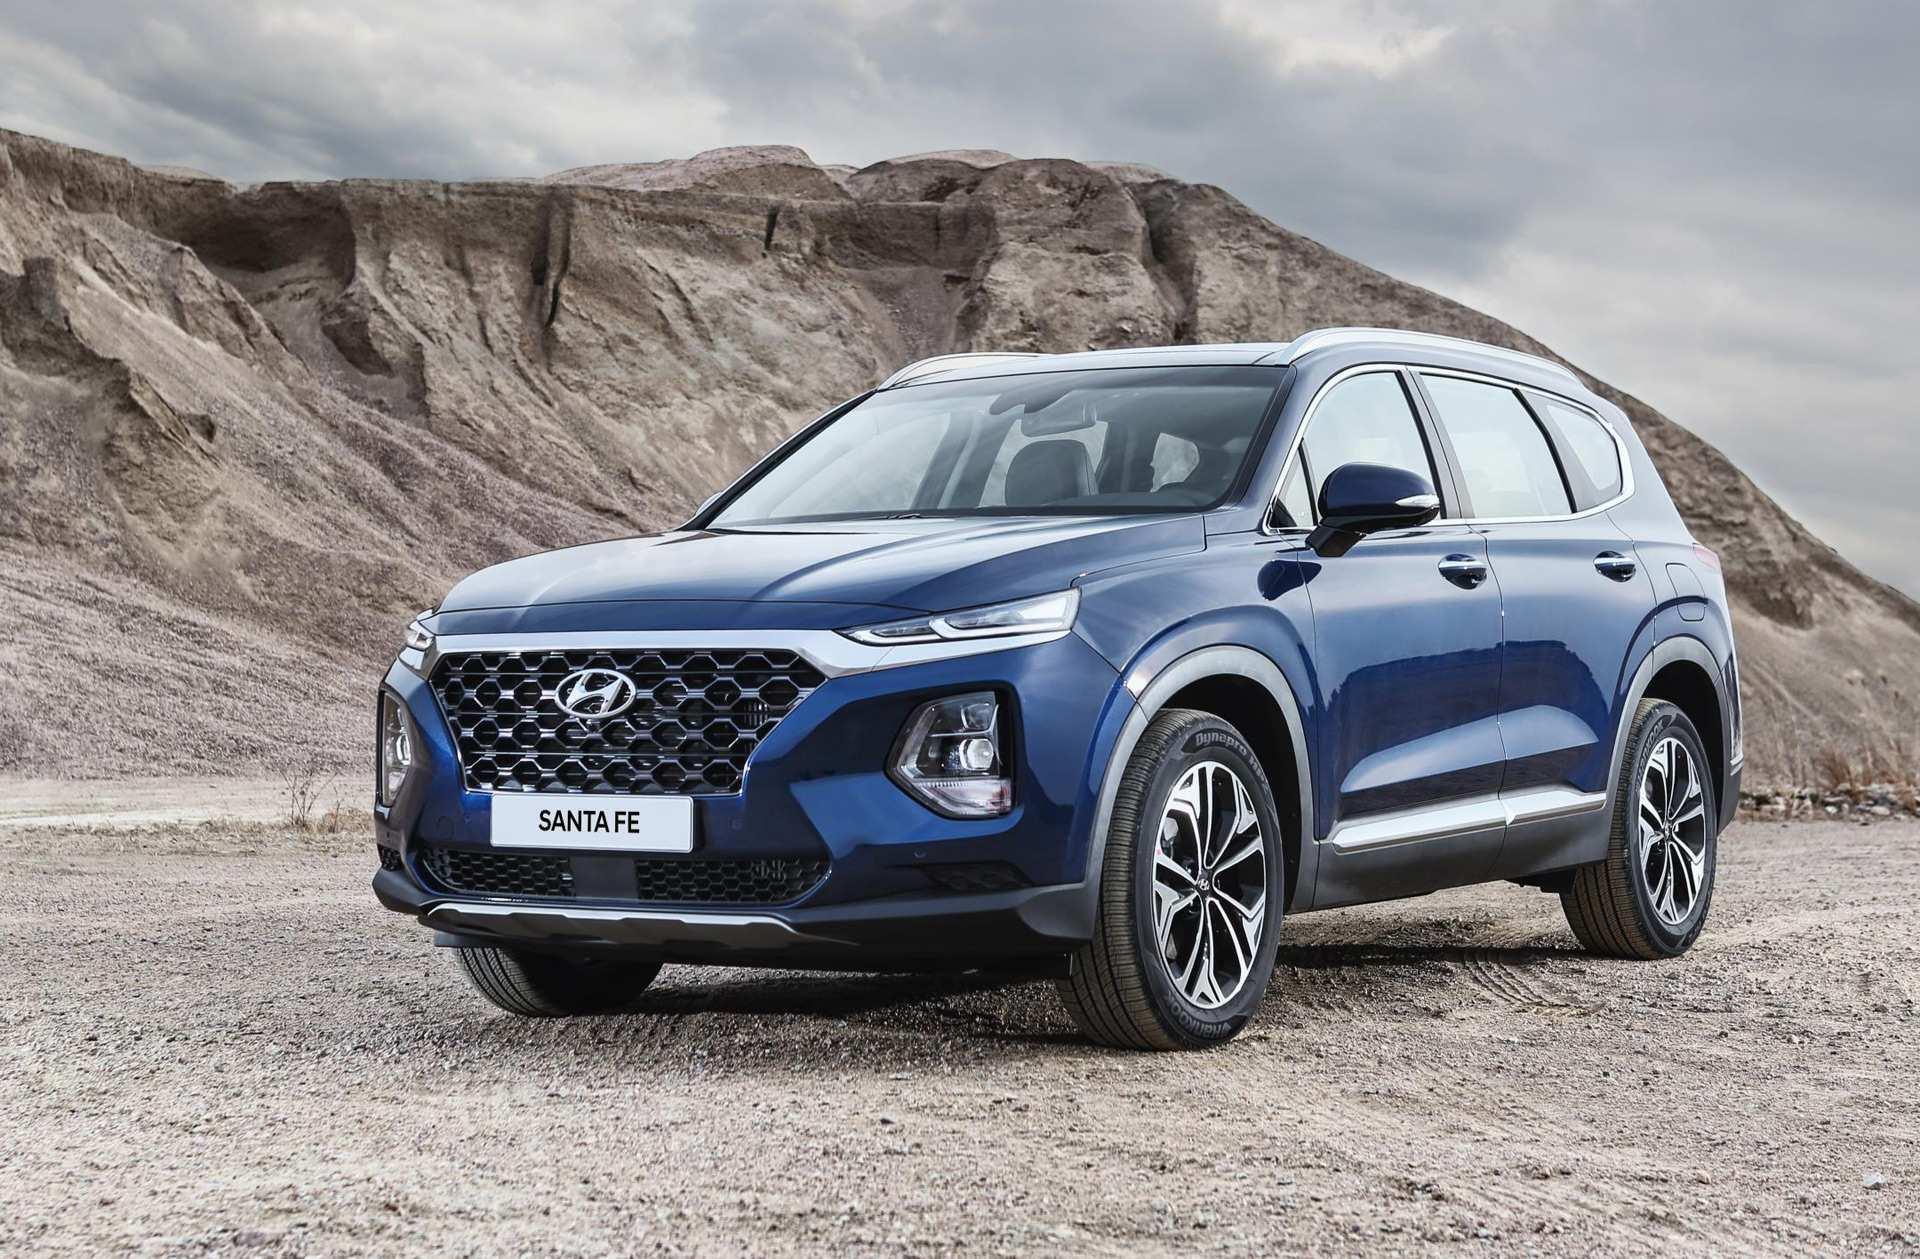 57 All New Hyundai Pickup 2020 Speed Test for Hyundai Pickup 2020